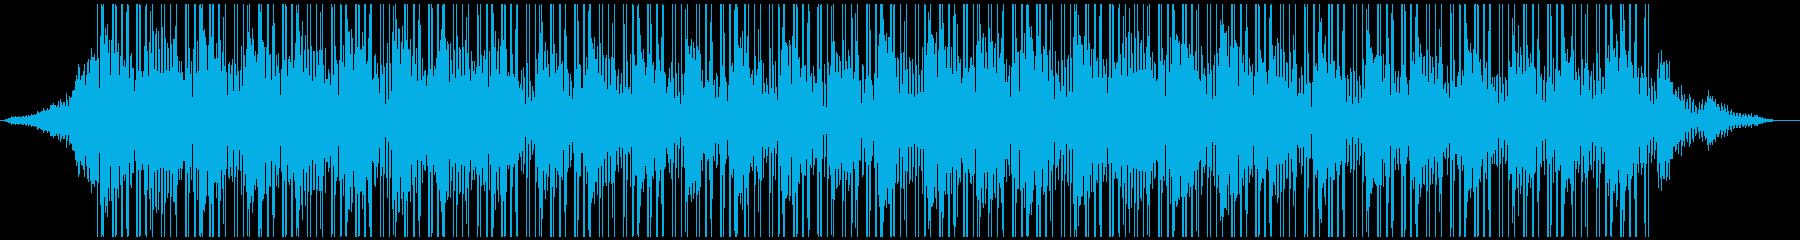 80's 静かでドリーミーなシンセポップの再生済みの波形